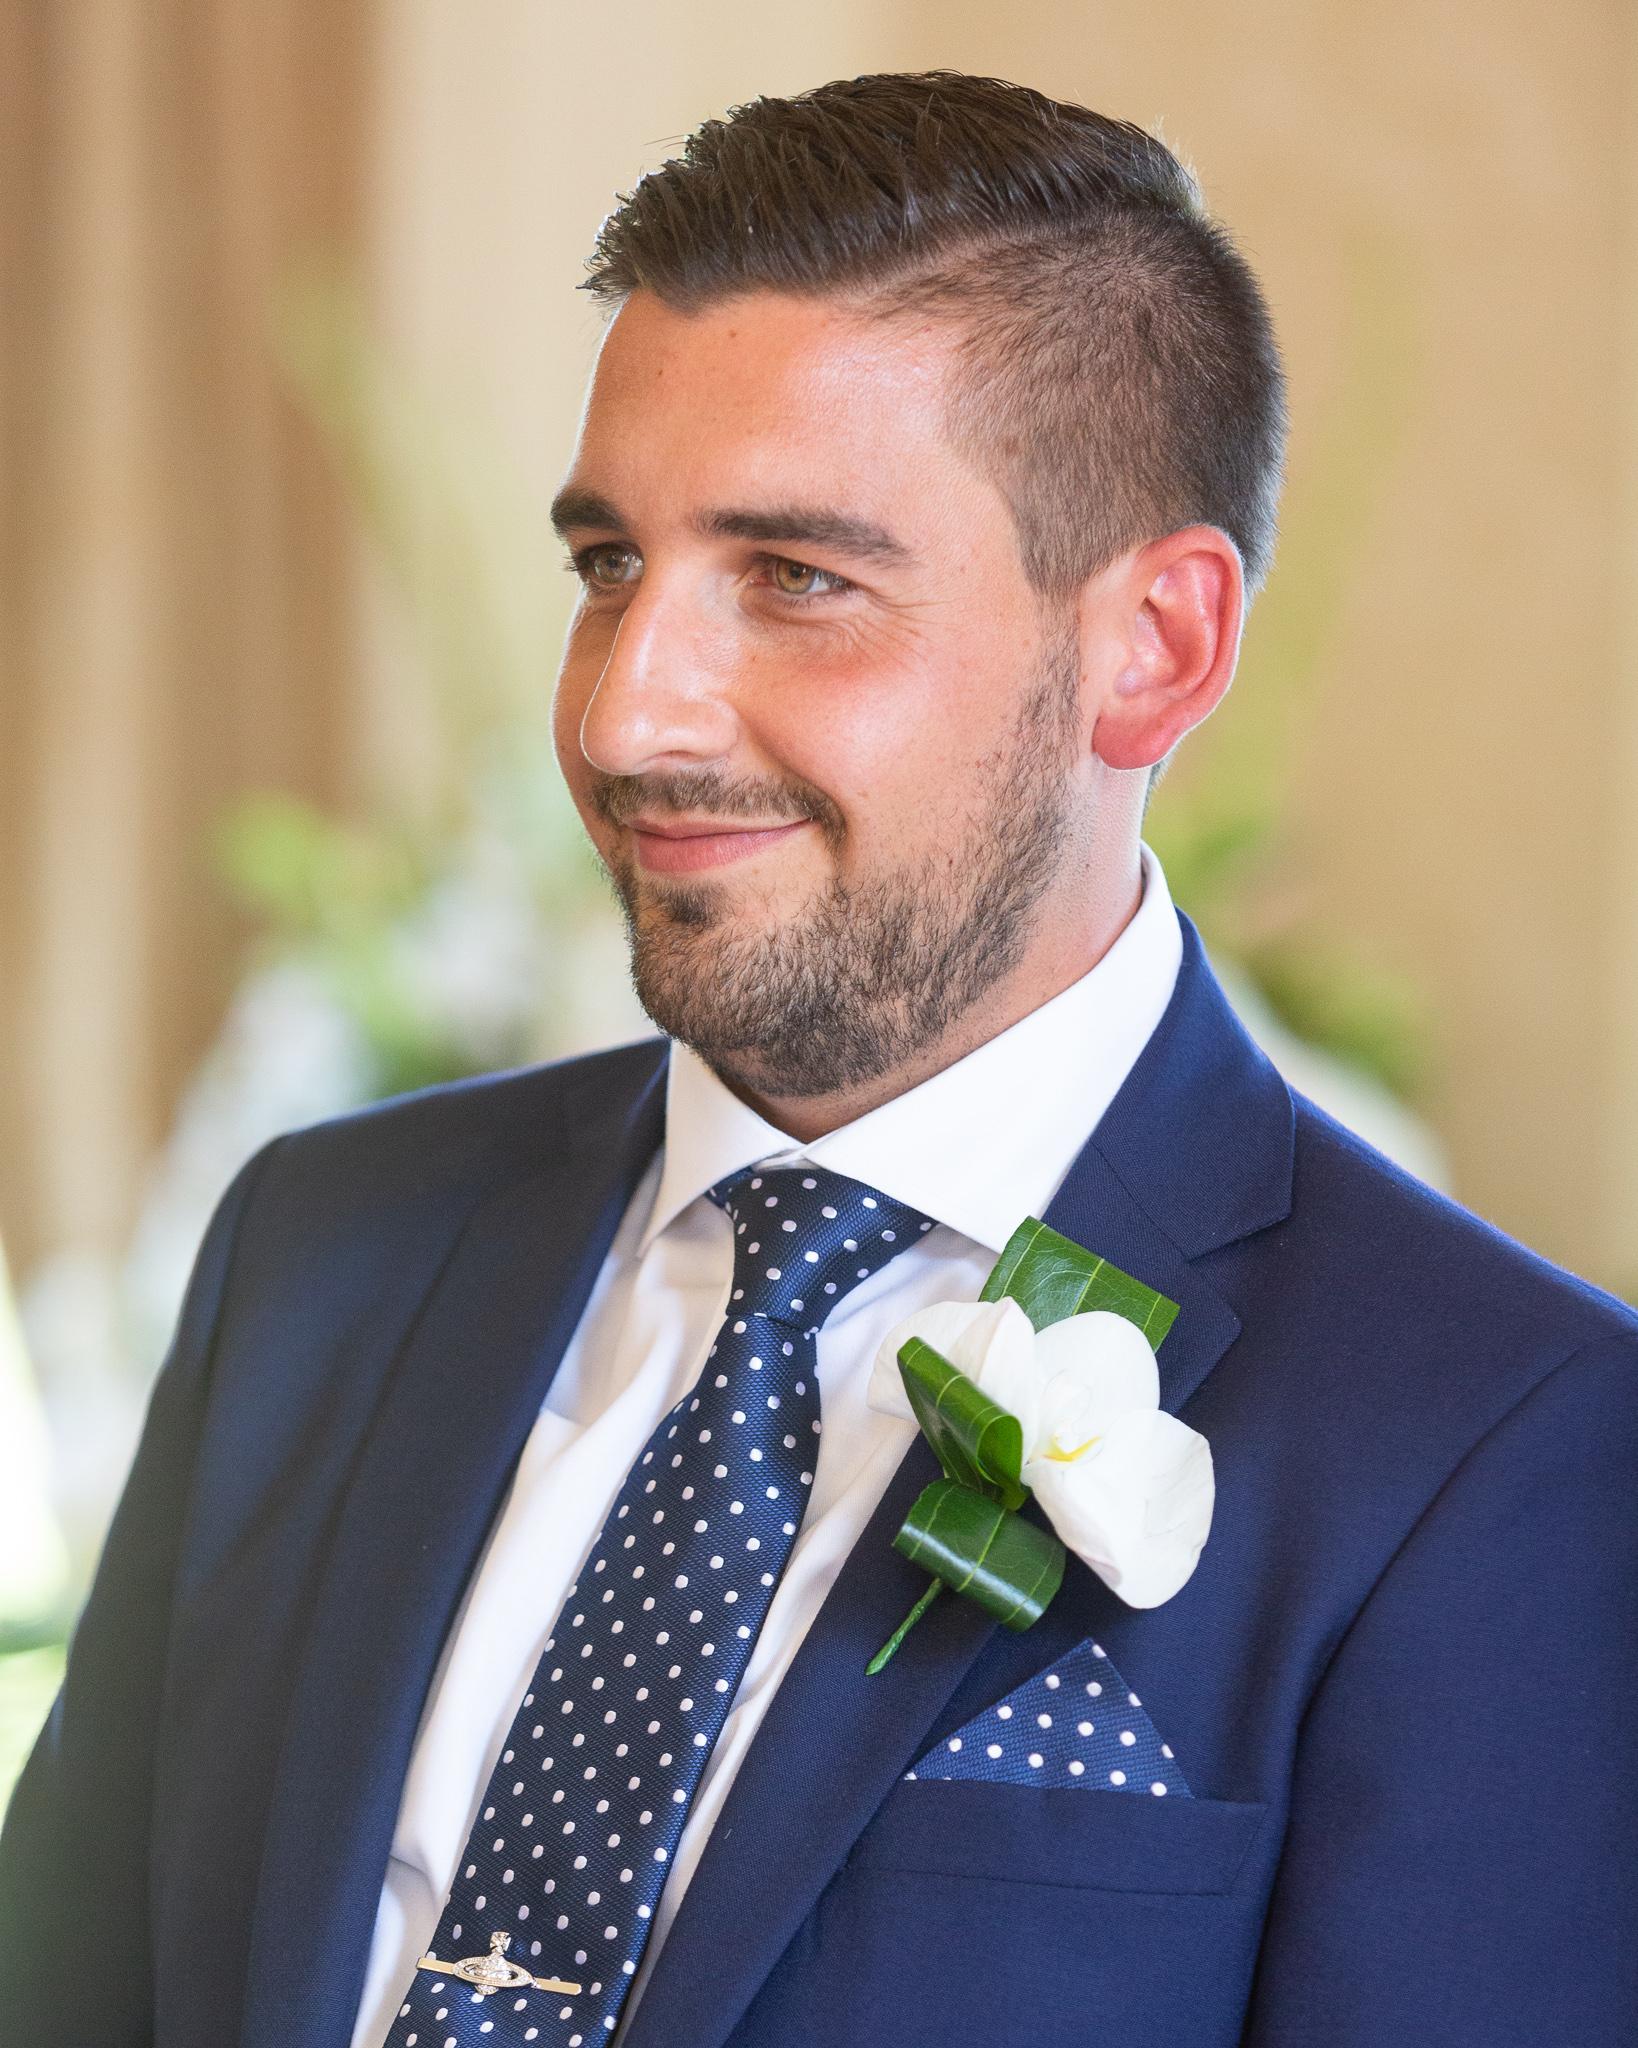 Groom_First_look_natural_wedding_photography_Rachel_Thornhill_Photographer